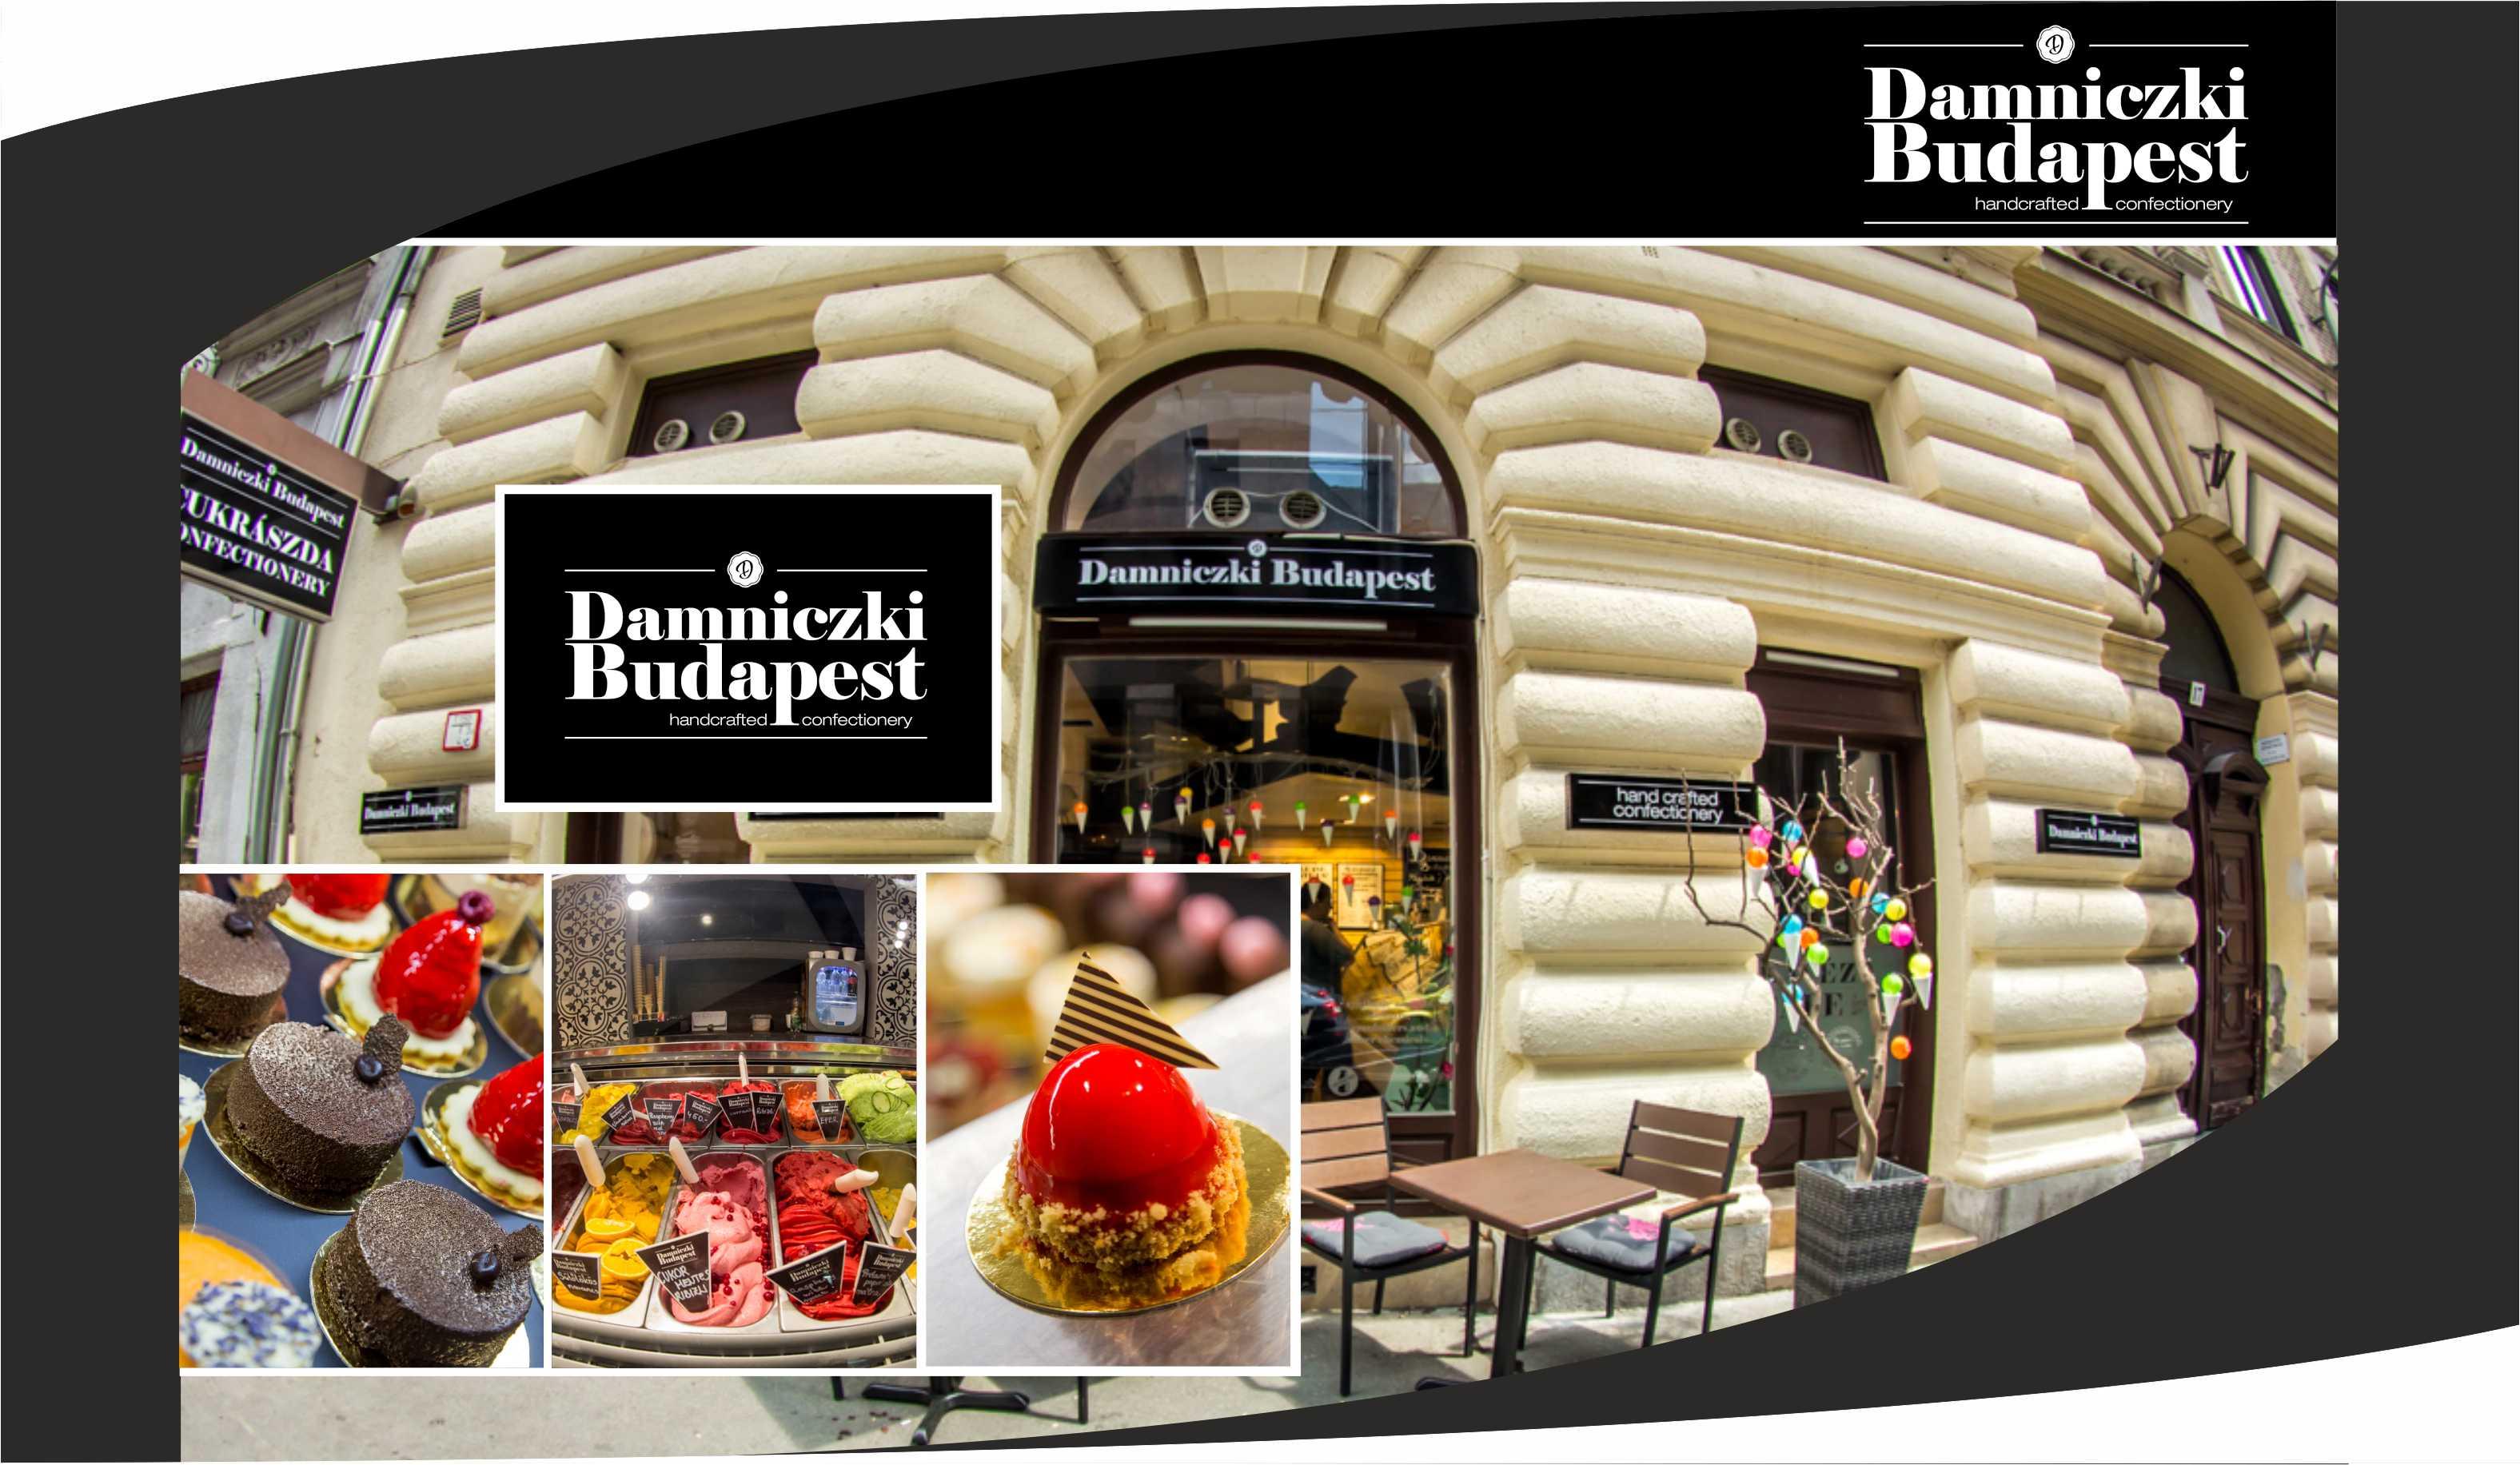 Damniczki Budapest